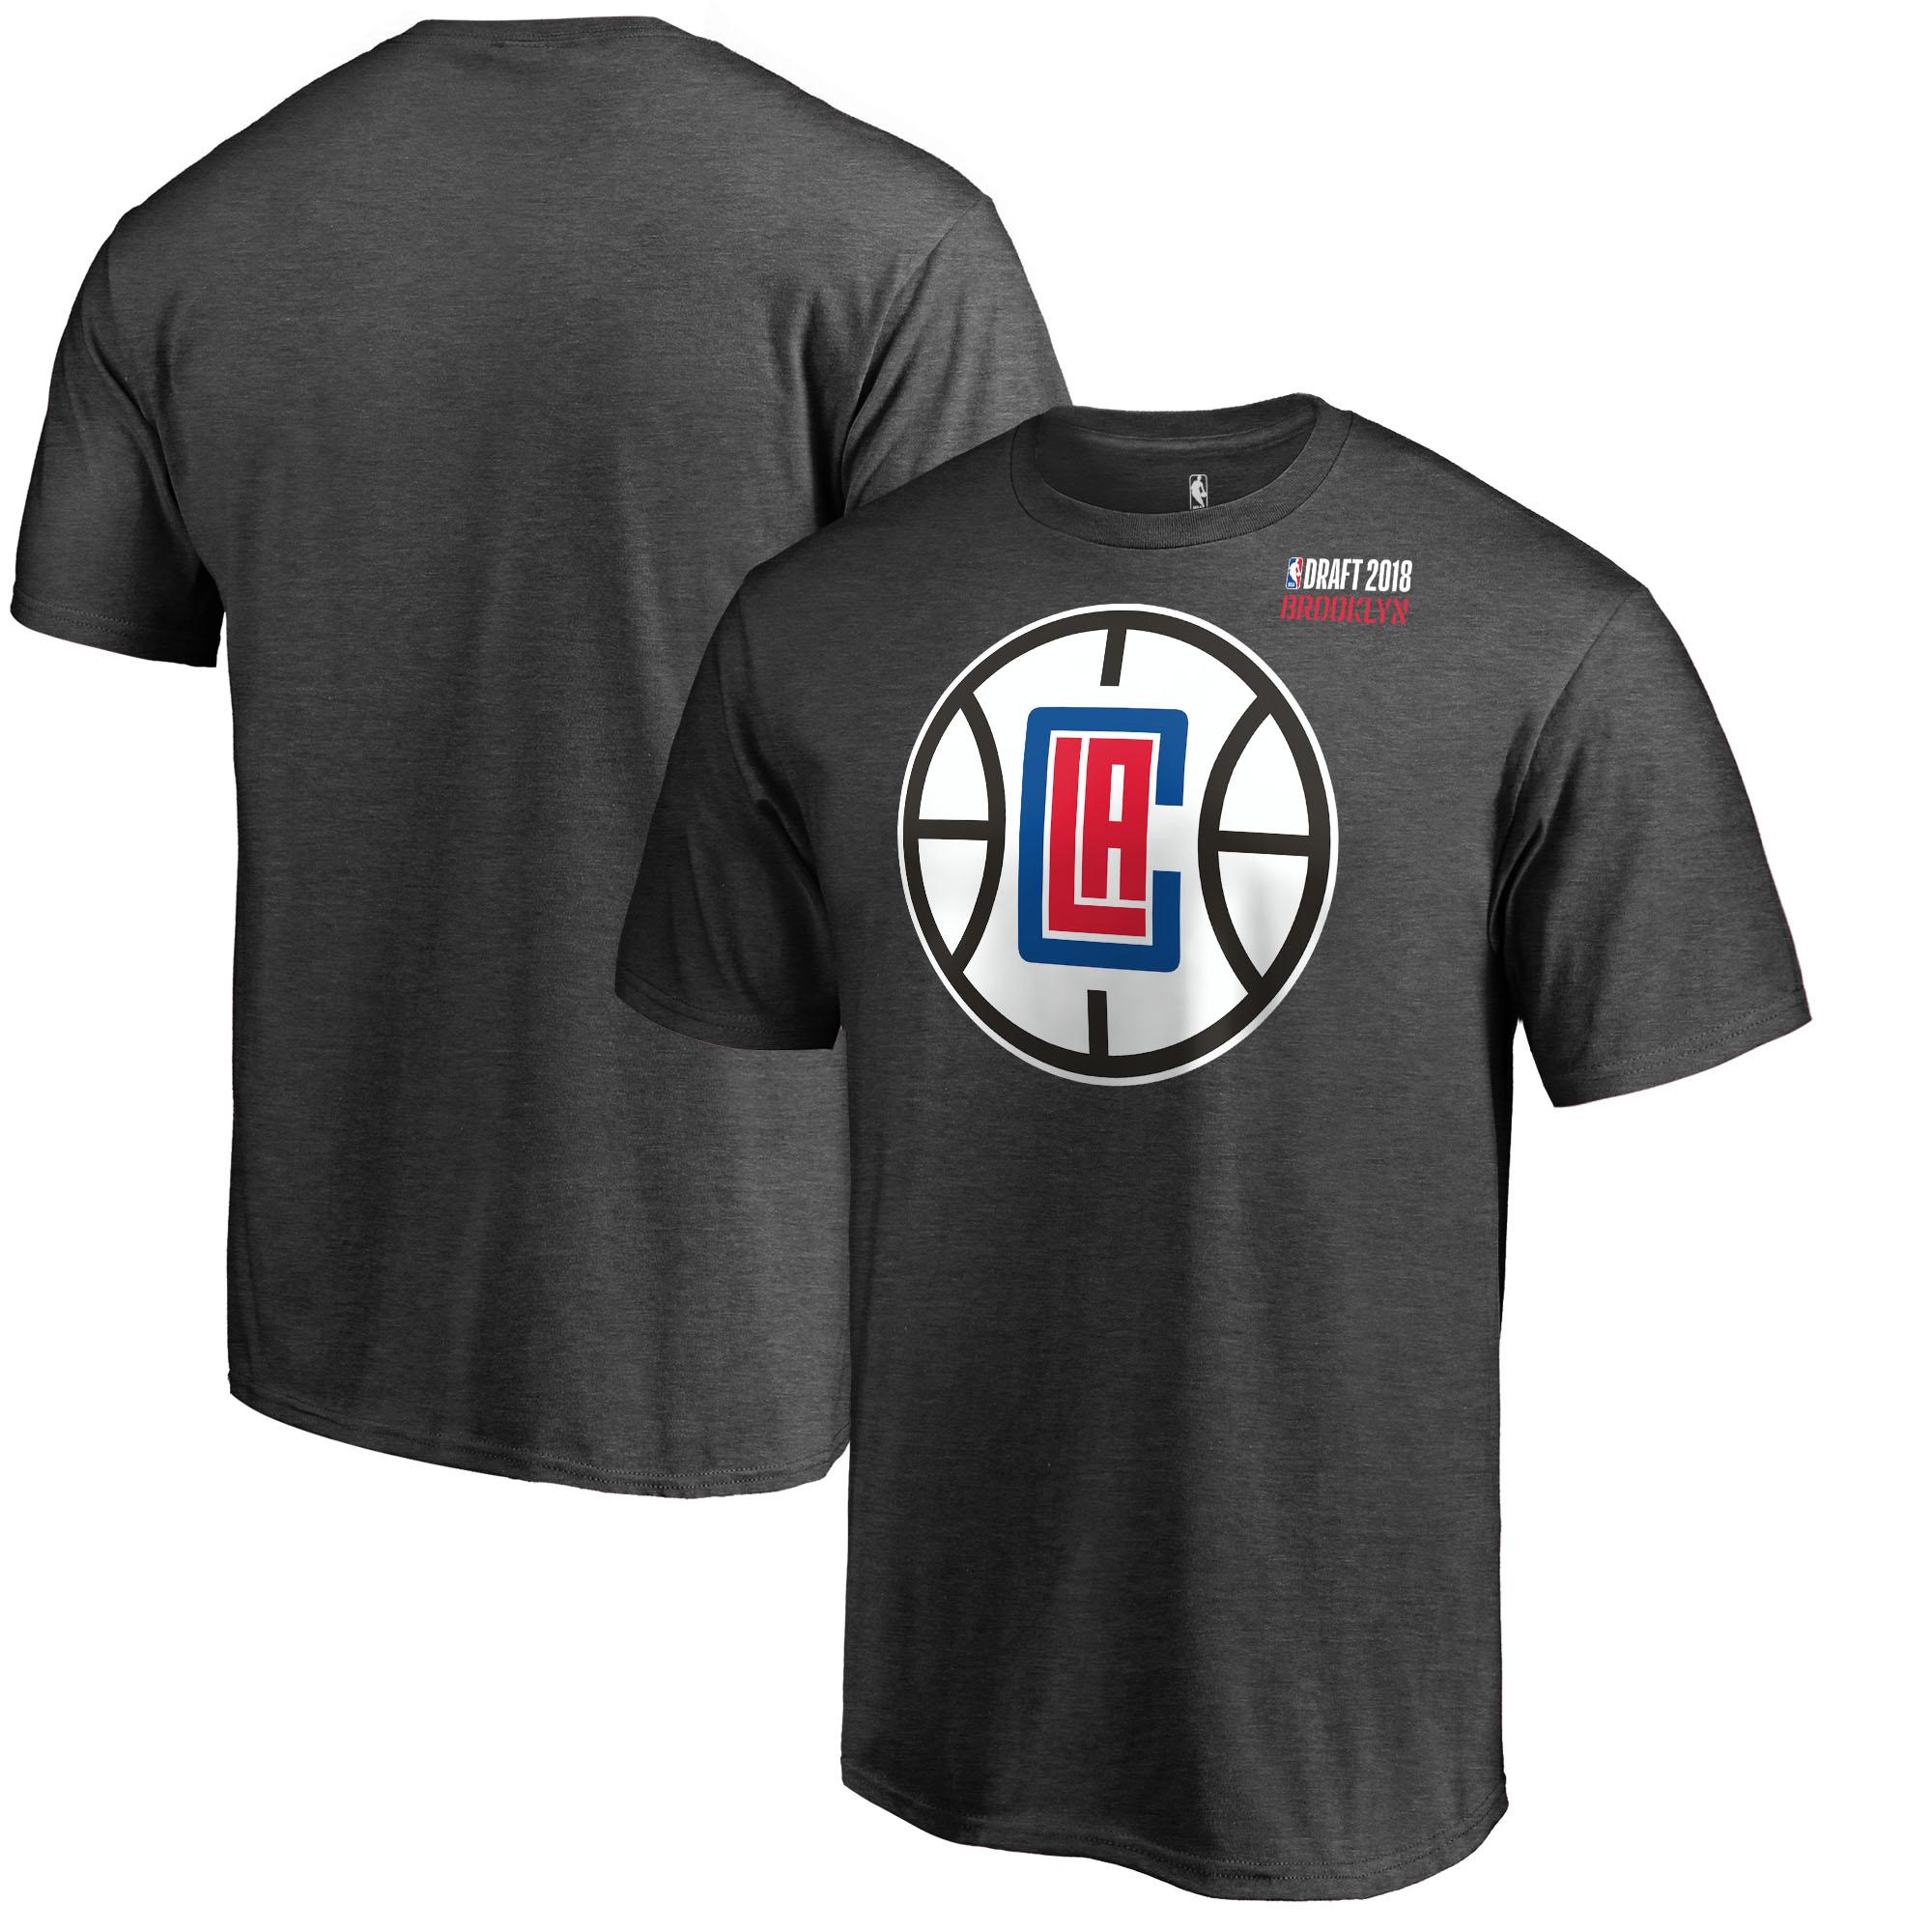 LA Clippers Fanatics Branded 2018 NBA Draft BKLYN T-Shirt - Heather Gray